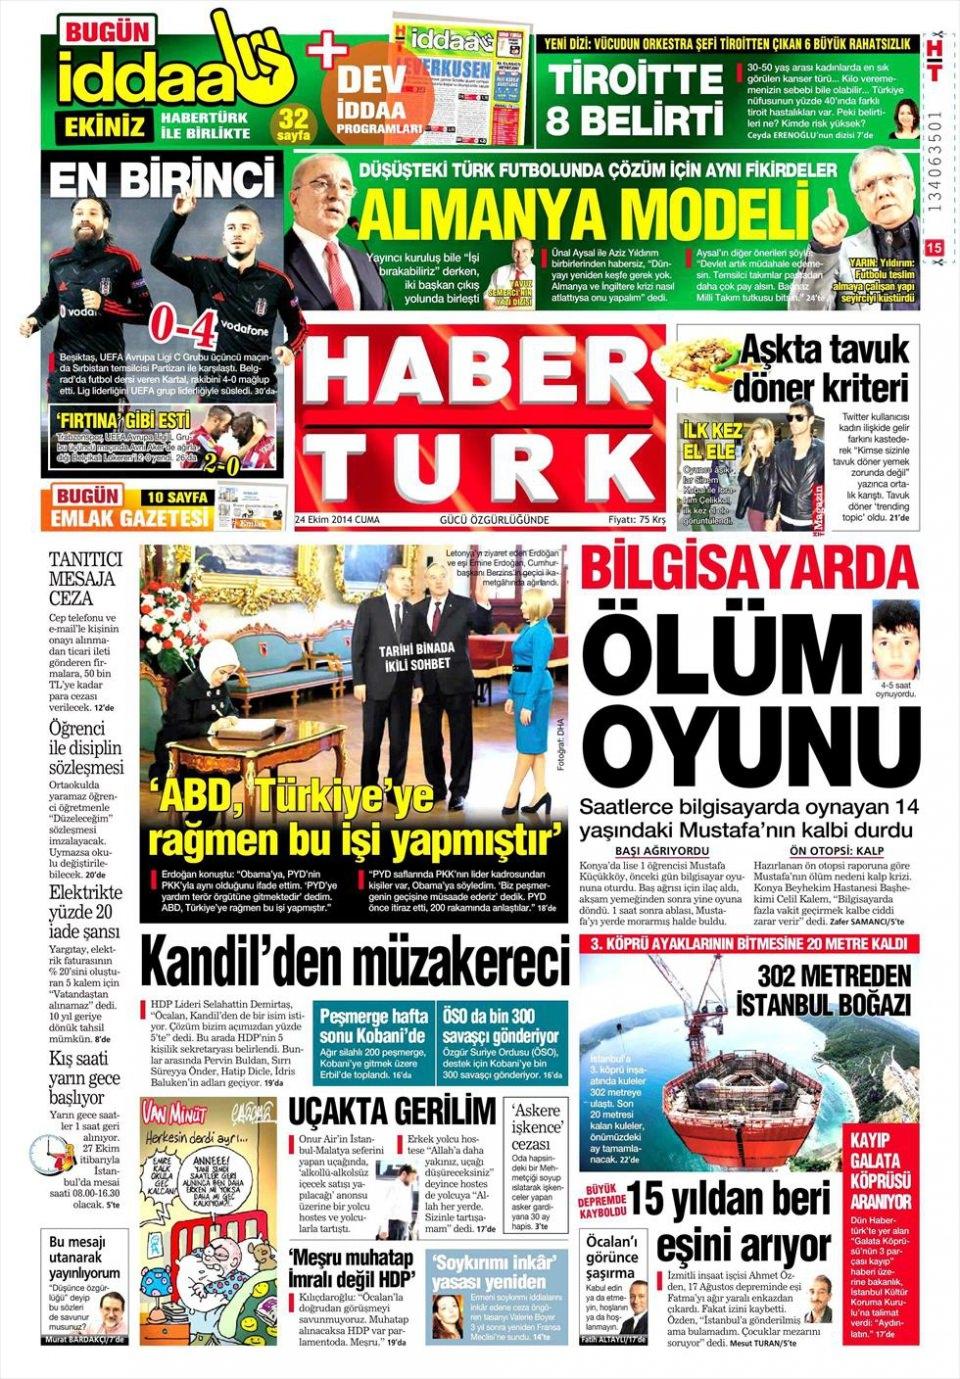 24 Ekim 2014 gazete manşetleri 9